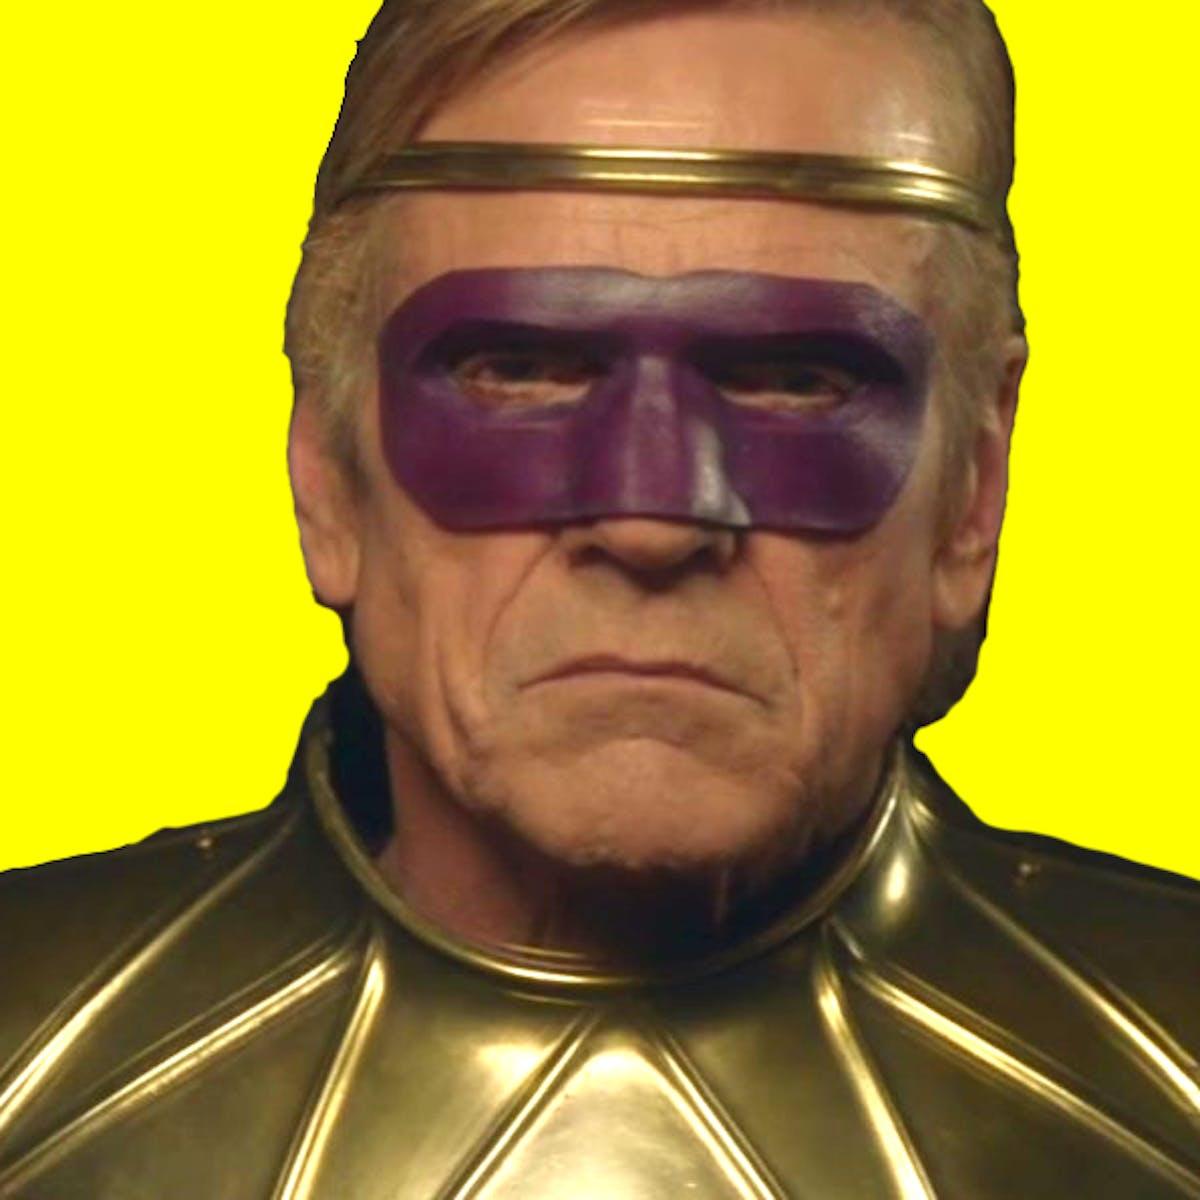 'Watchmen' Episode 5 explains a huge Adrian Veidt mystery from Ep. 1